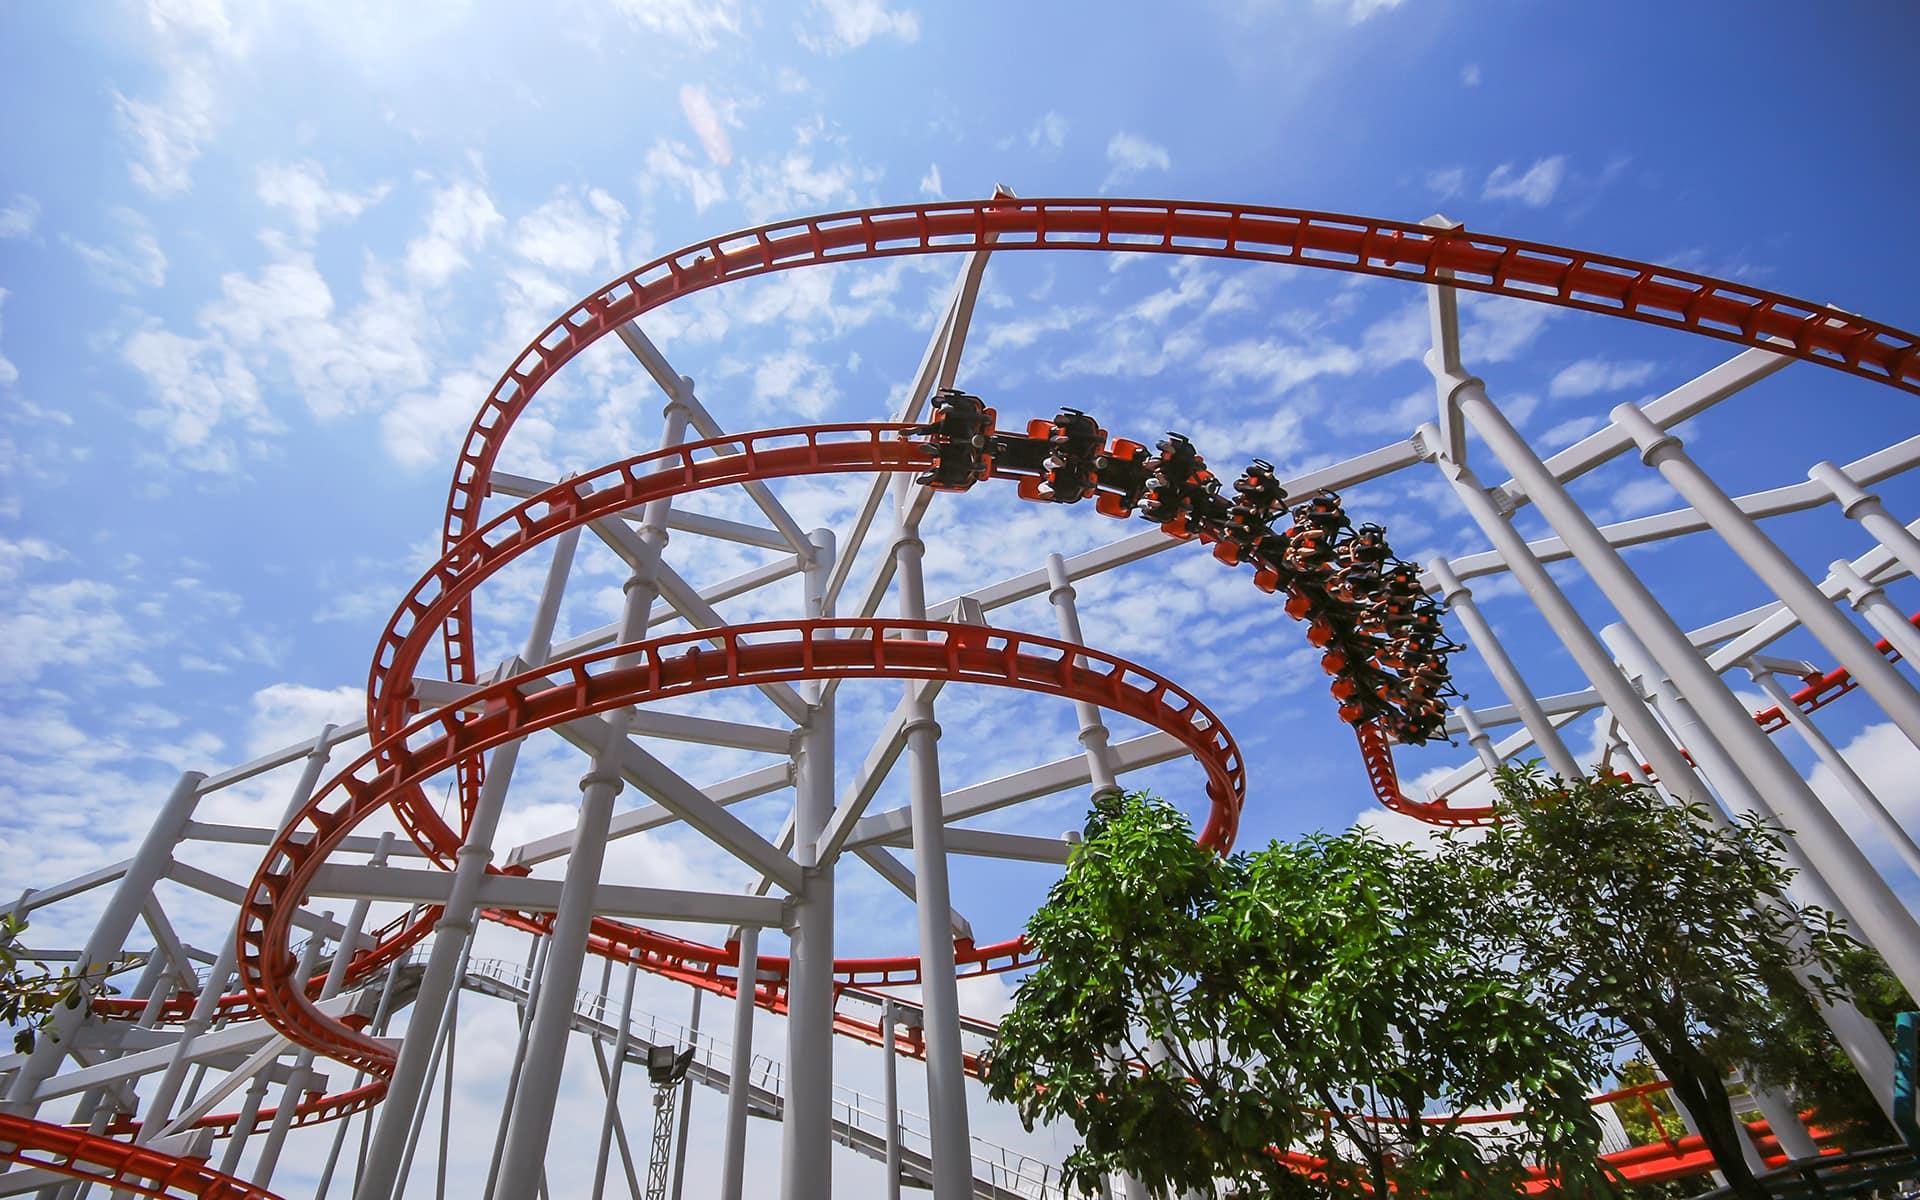 BPMN Roundtrip - rollercoaster